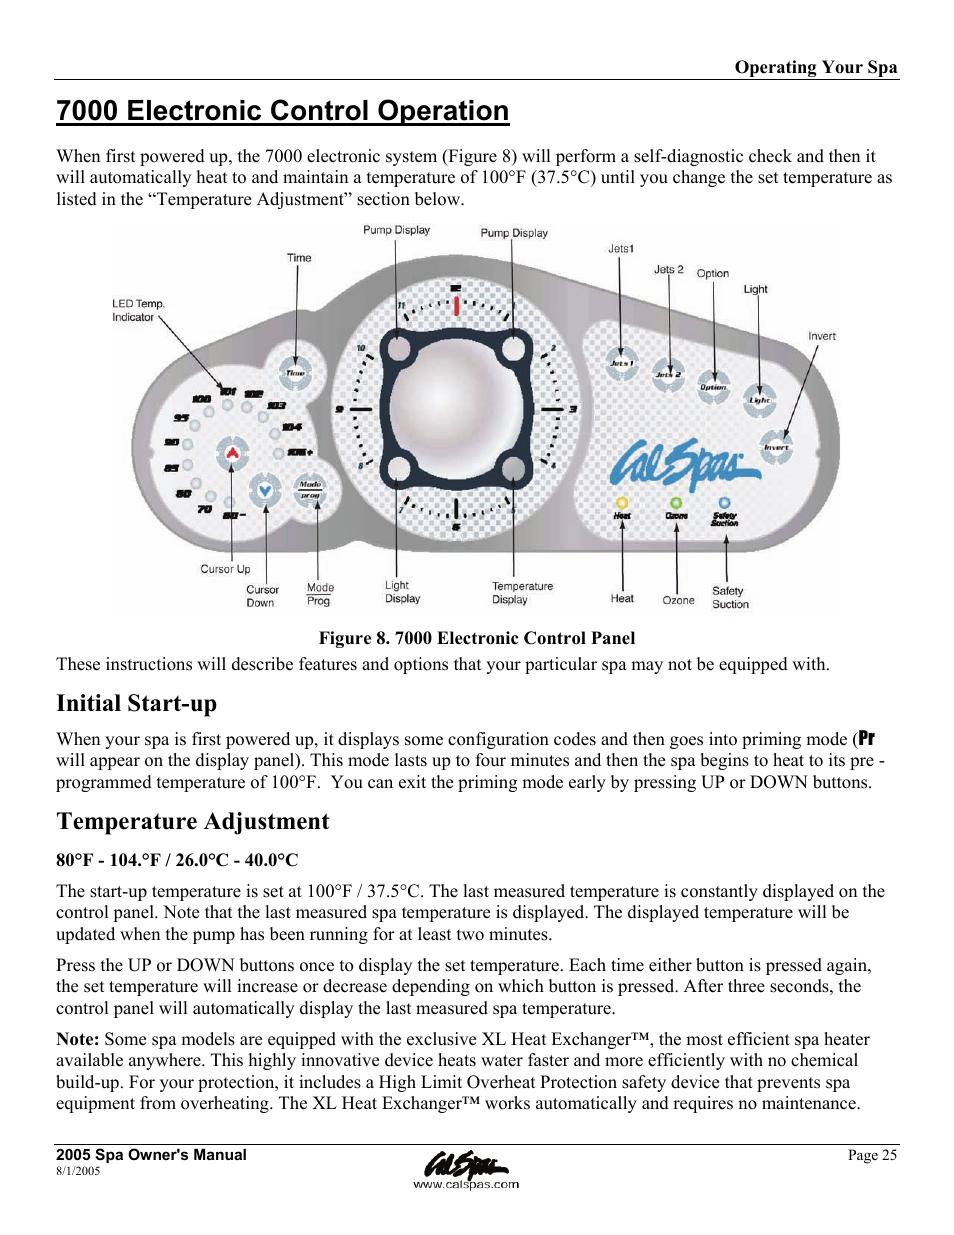 Cal Spa Diagram - Diagram Design Sources circuit-ivory -  circuit-ivory.paoloemartina.itpaoloemartina.it